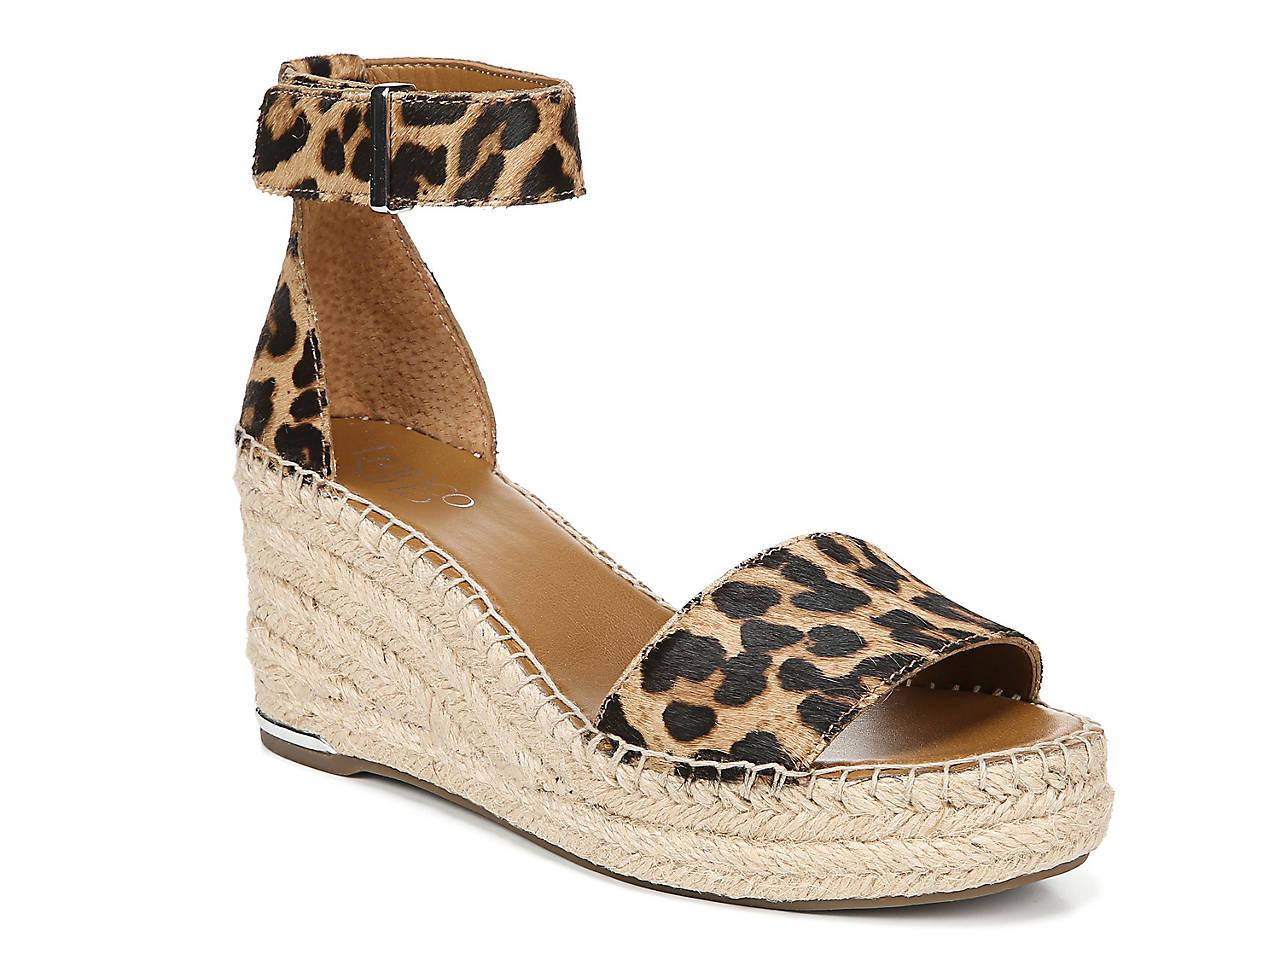 deb7f0d01a39 Franco Sarto Clemens Espadrille Wedge Sandal Women's Shoes | DSW